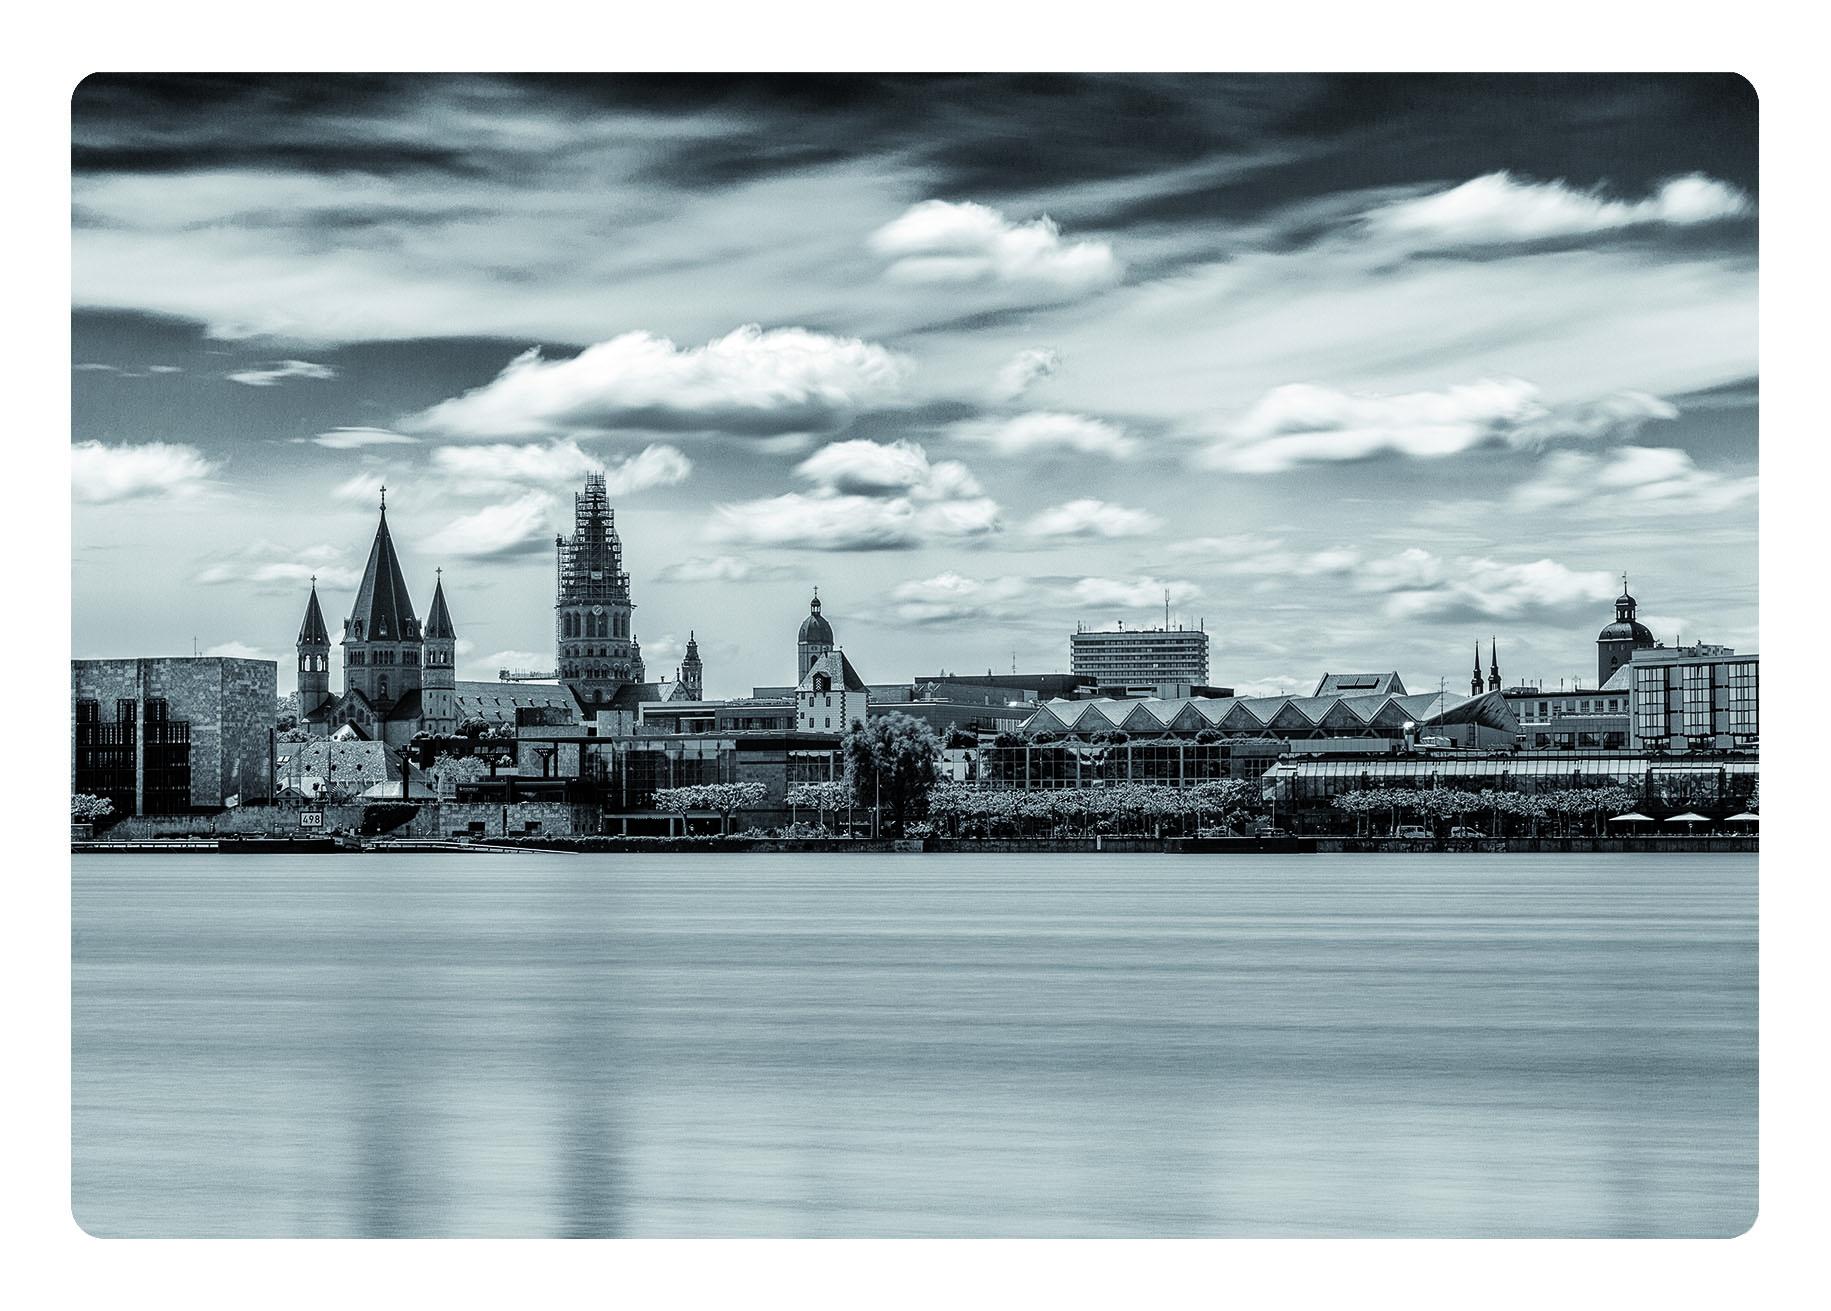 querformat-fotografie - Achim Katzberg - 01_1 Postkarten_Mainz_Mainz